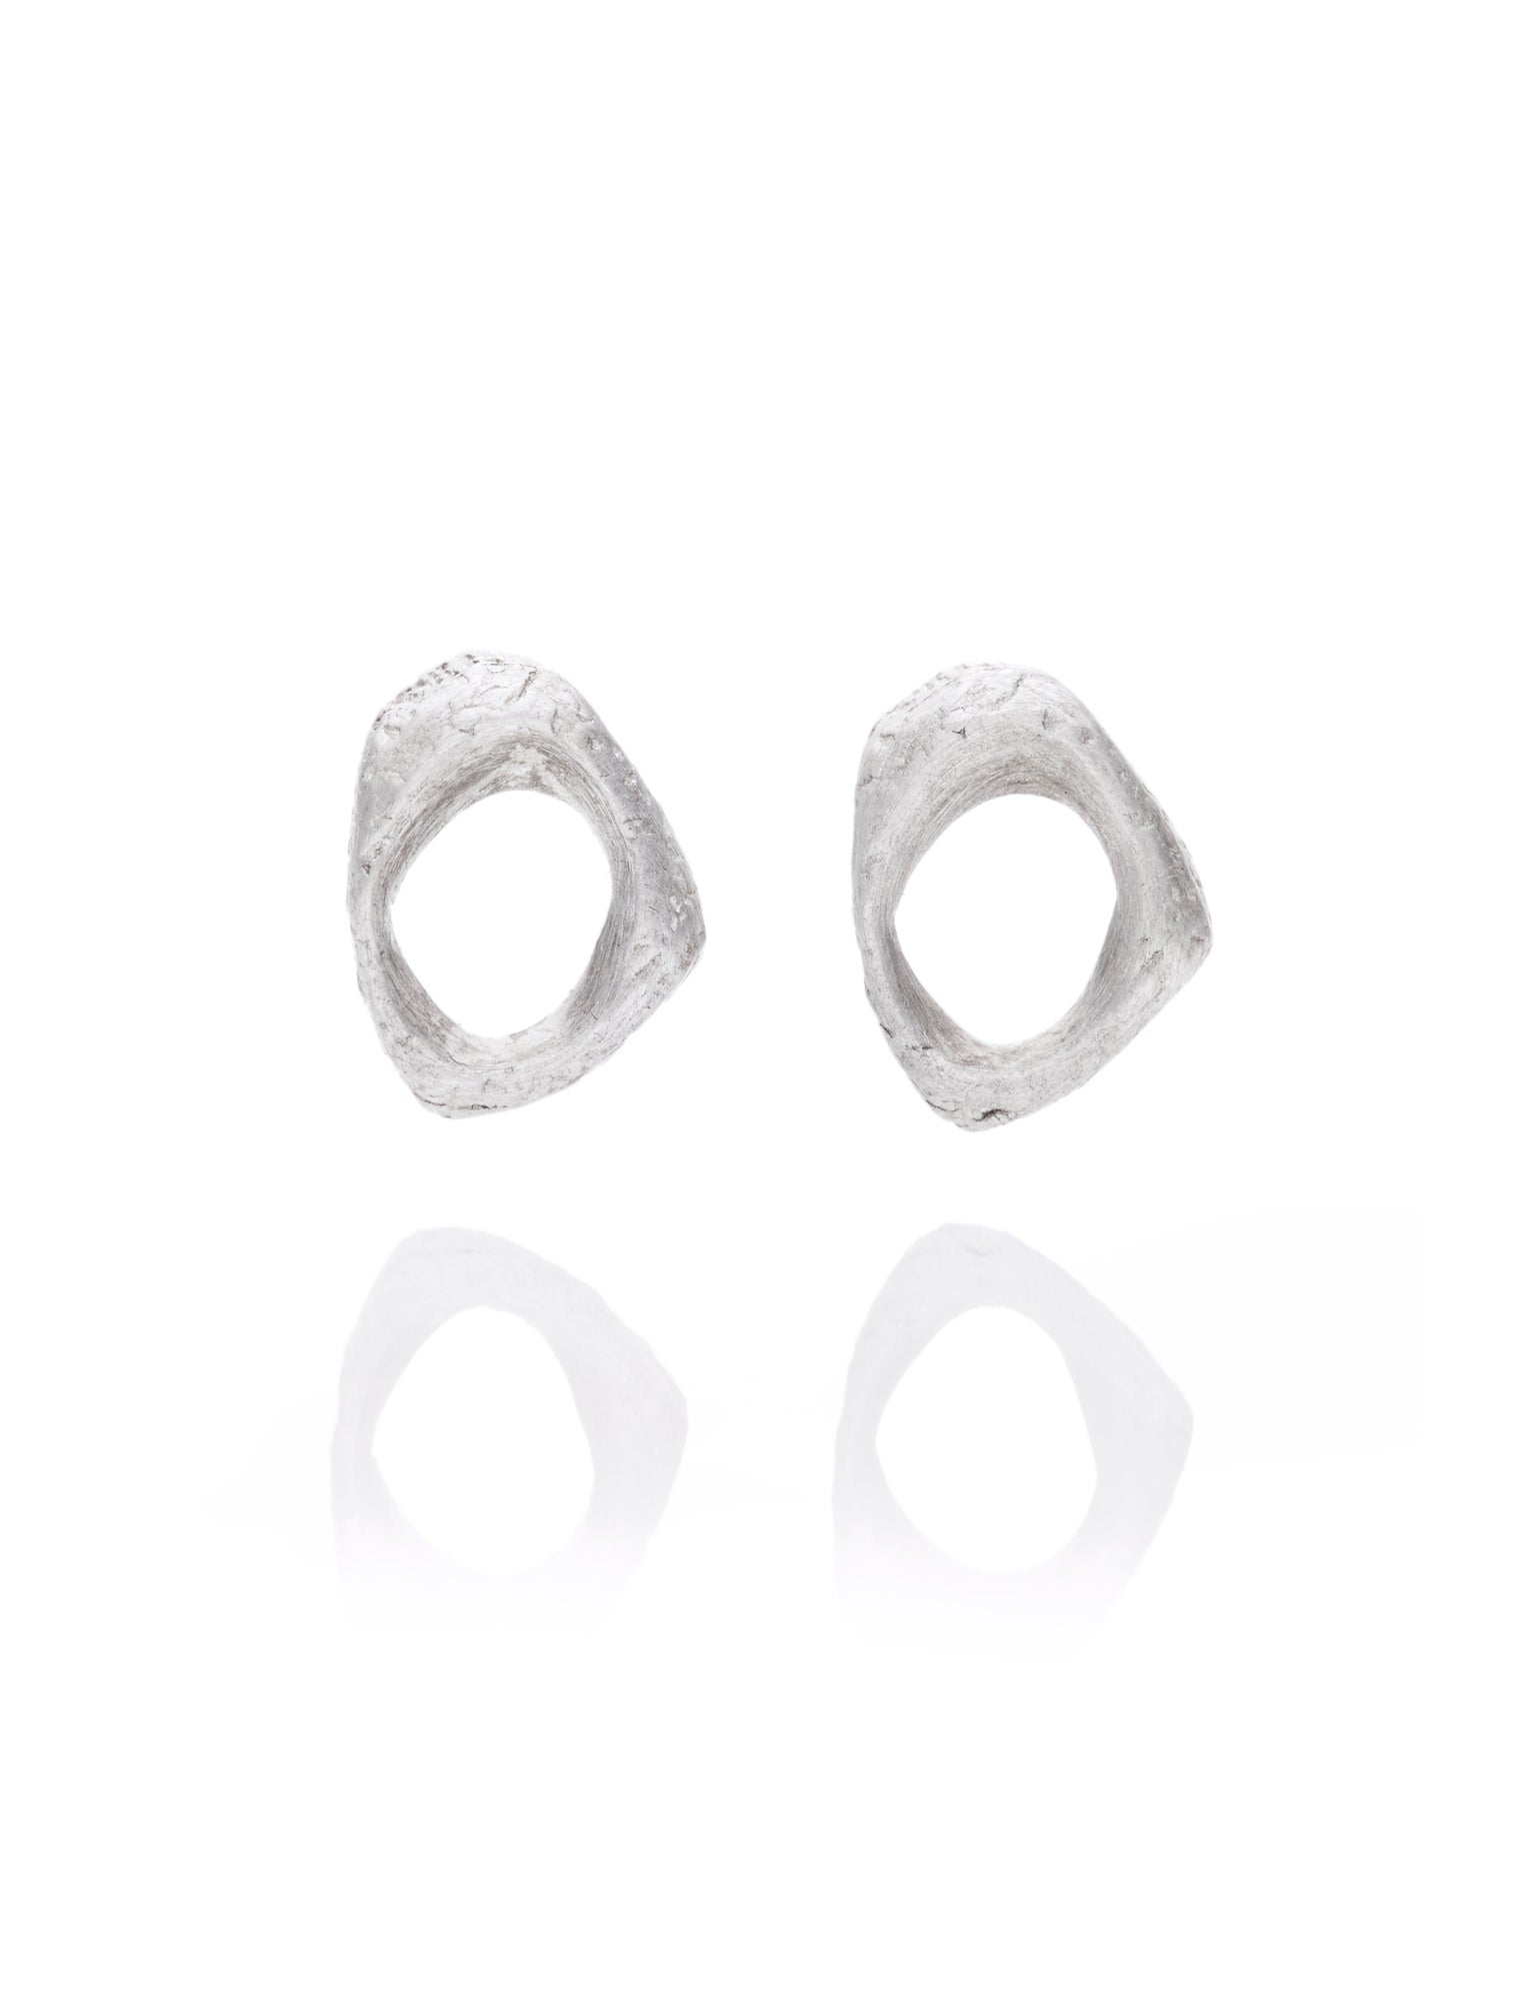 Image of Texture stud earrings